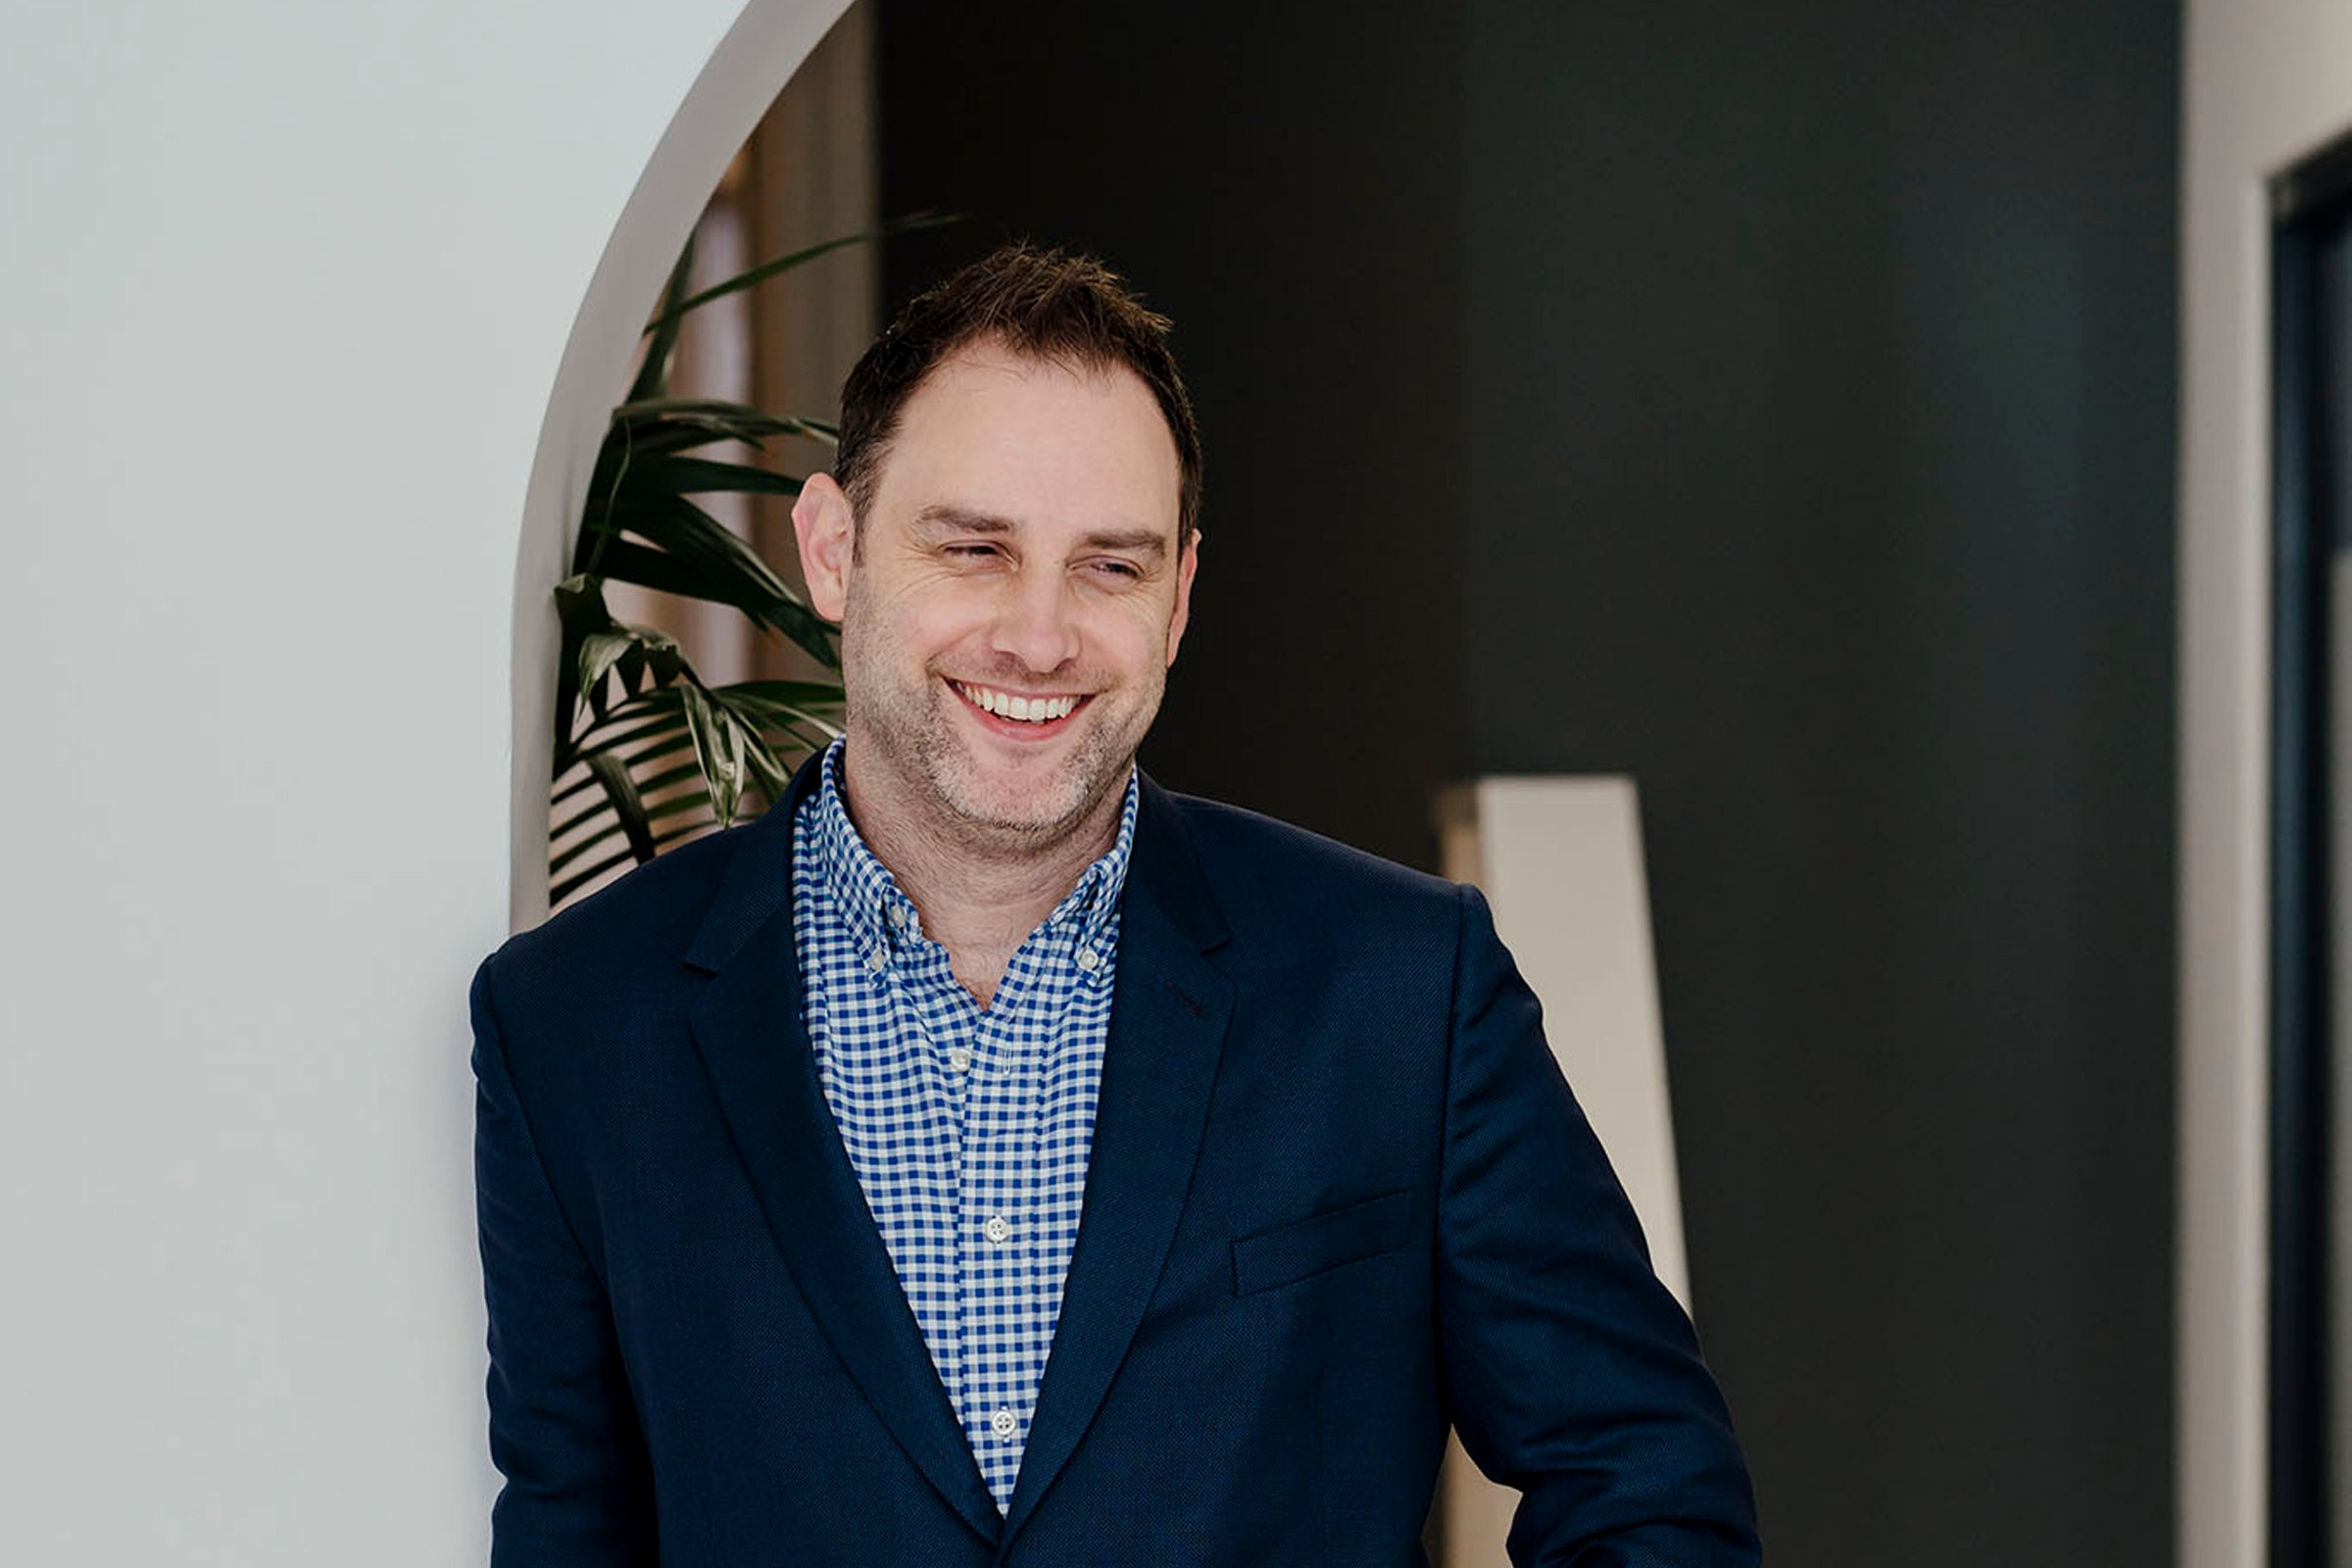 Michael Glarvey, Director